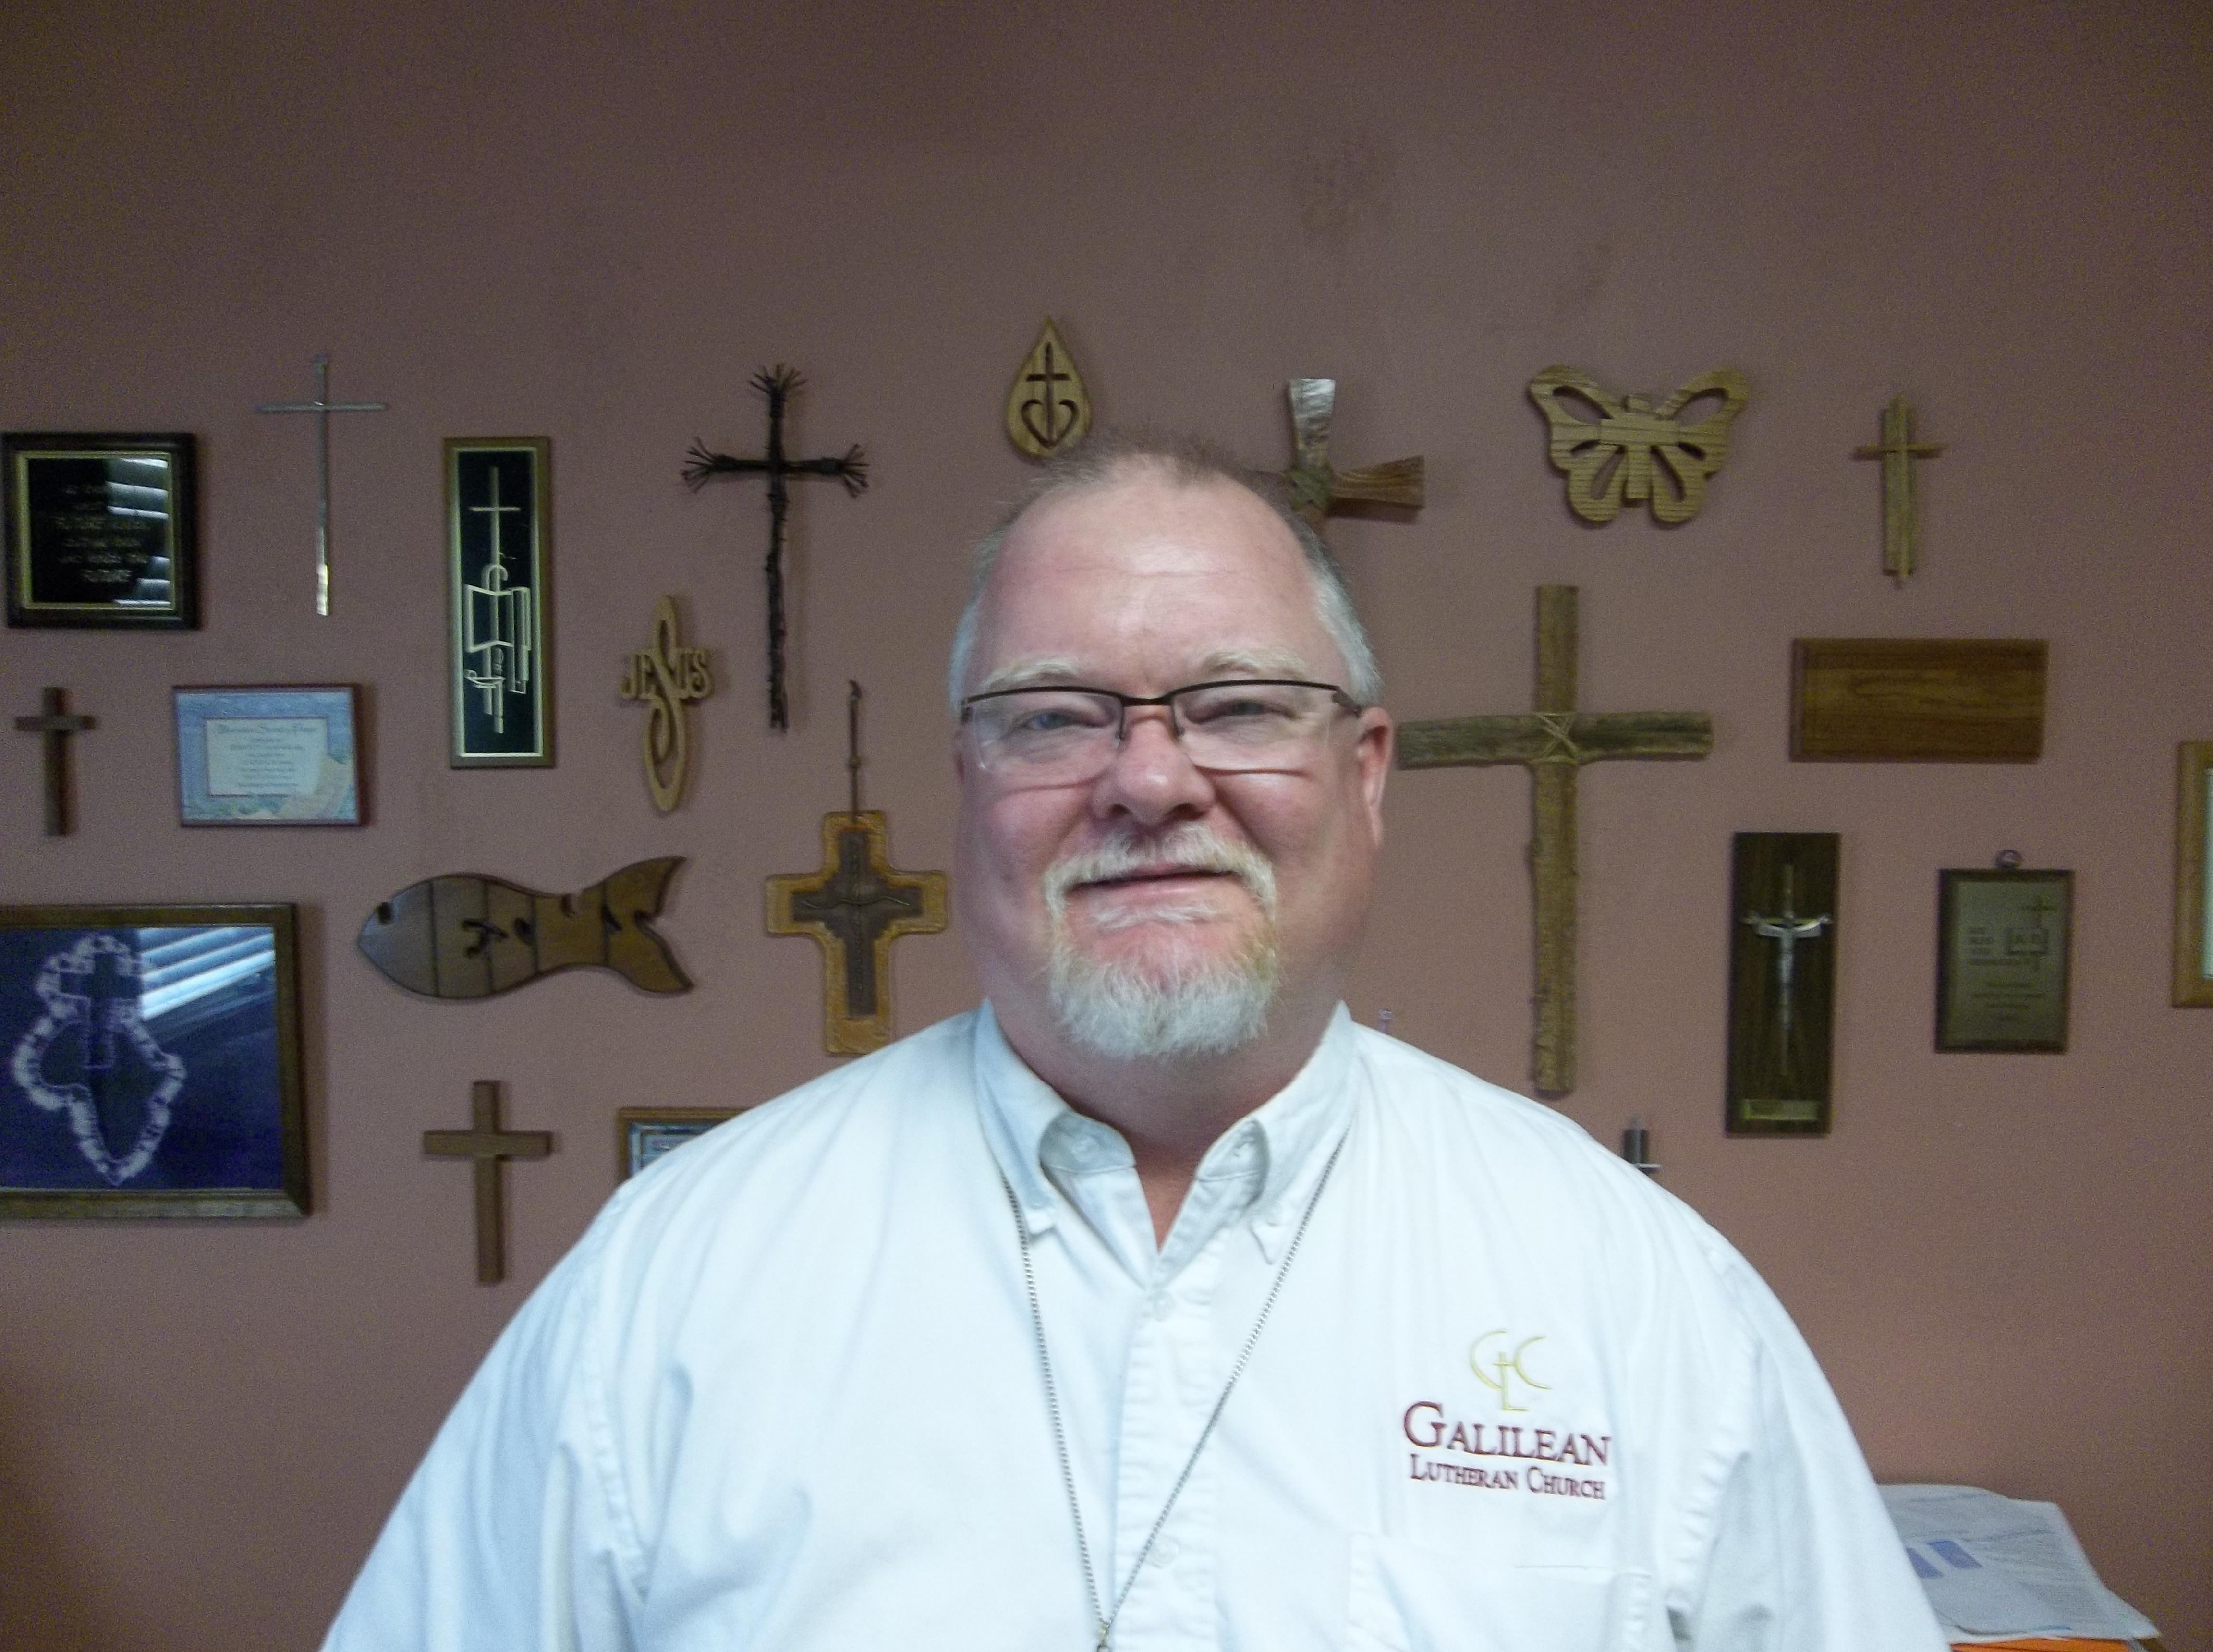 Pastor Scot McCluskey